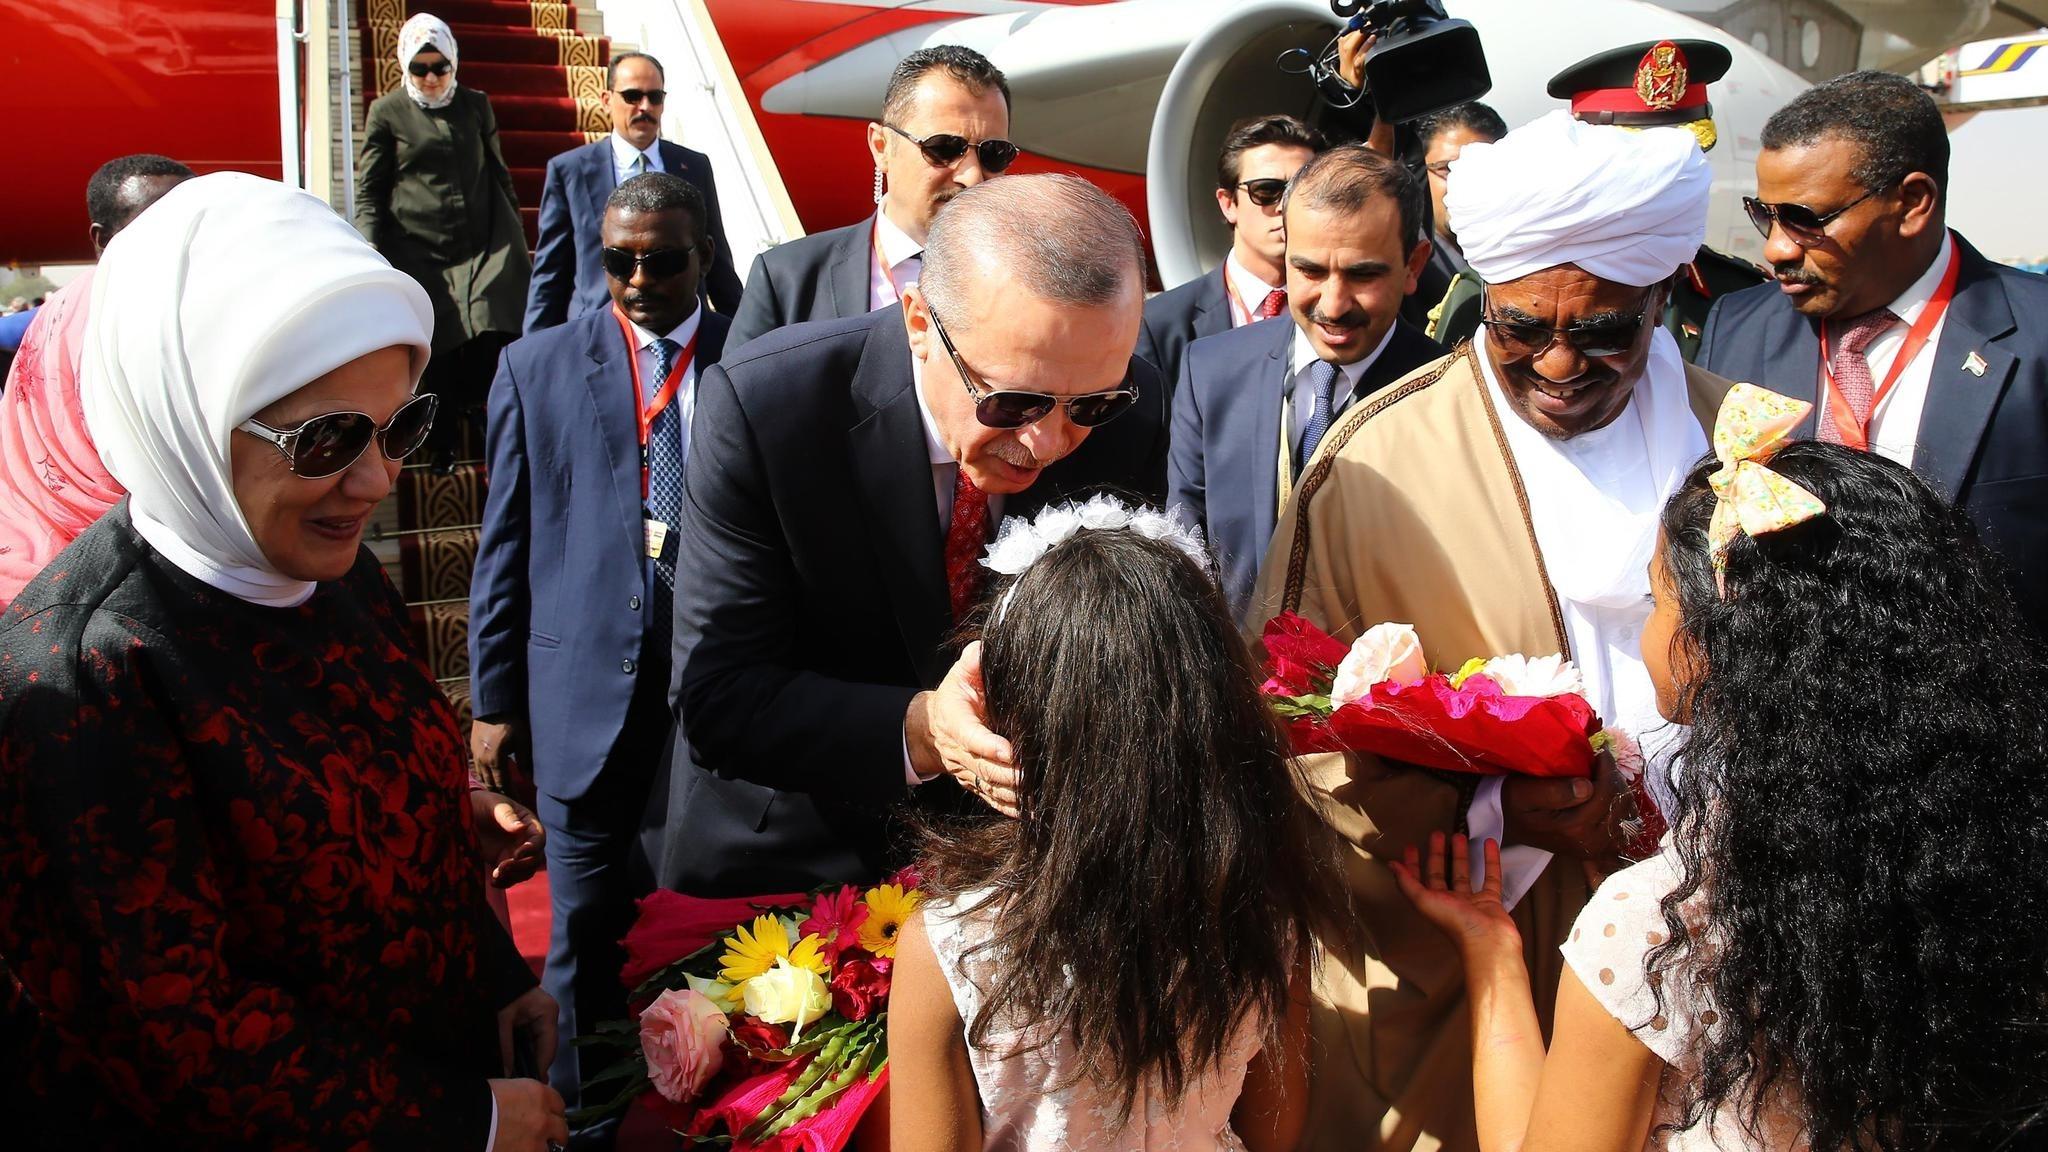 President Recep Tayyip Erdou011fan with Sudanese President Omar al-Bashir (Right) in Khartoum, Sudan, in December 2017.